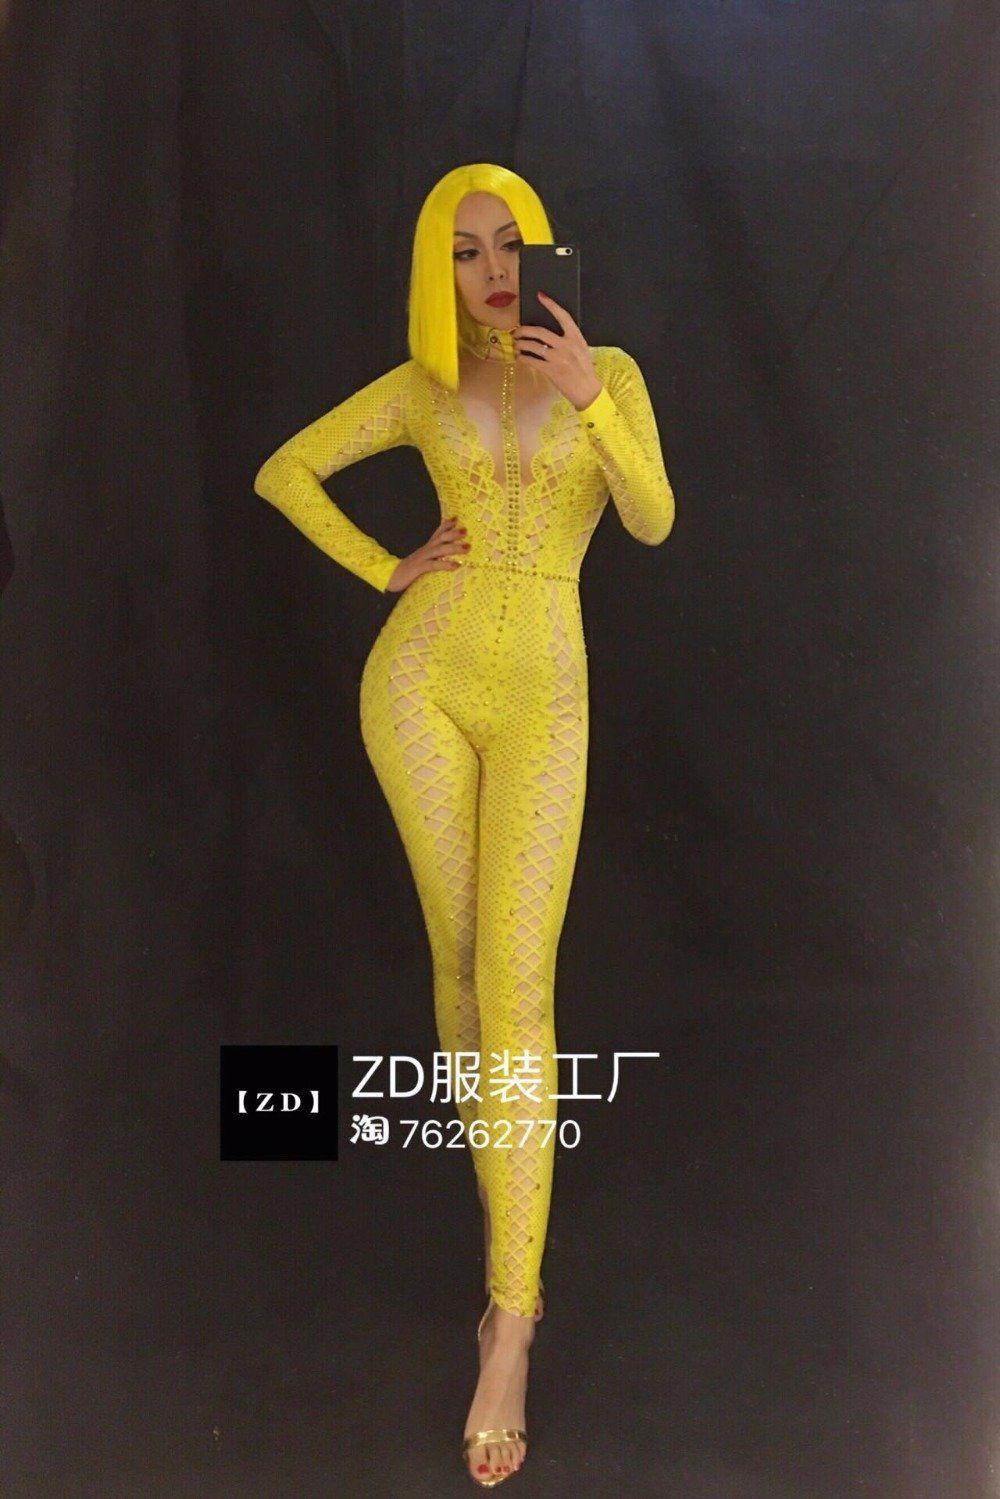 84.98 Yellow Bodysuit Crystals Jumpsuit Rhinestone Bodysuit Rhinestone  Bodysuit Party Sequins Bodysuit Costumes Stage Show Nightclub Dress  Performance ... 06bcf75c2956